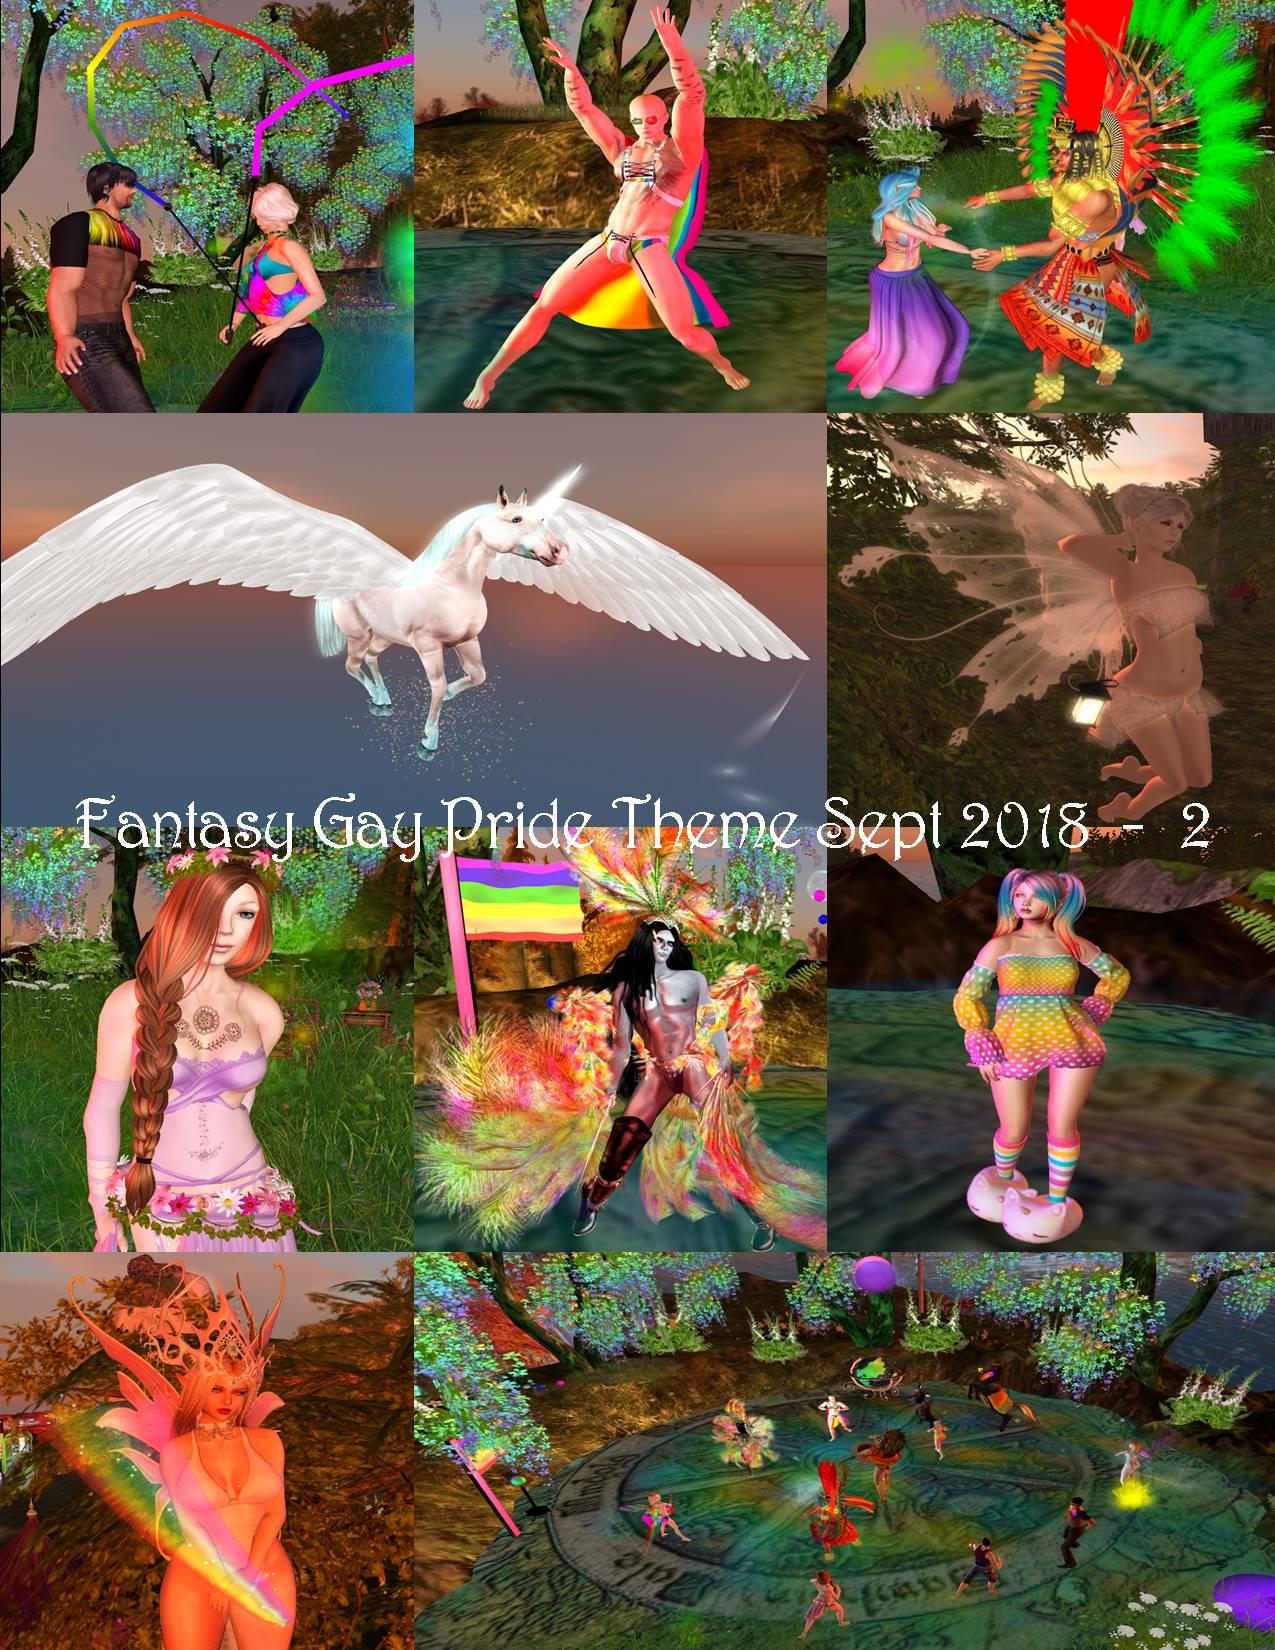 FANTASY GAY PRIDE THEME COLLAGE SEPT 2018 - 2